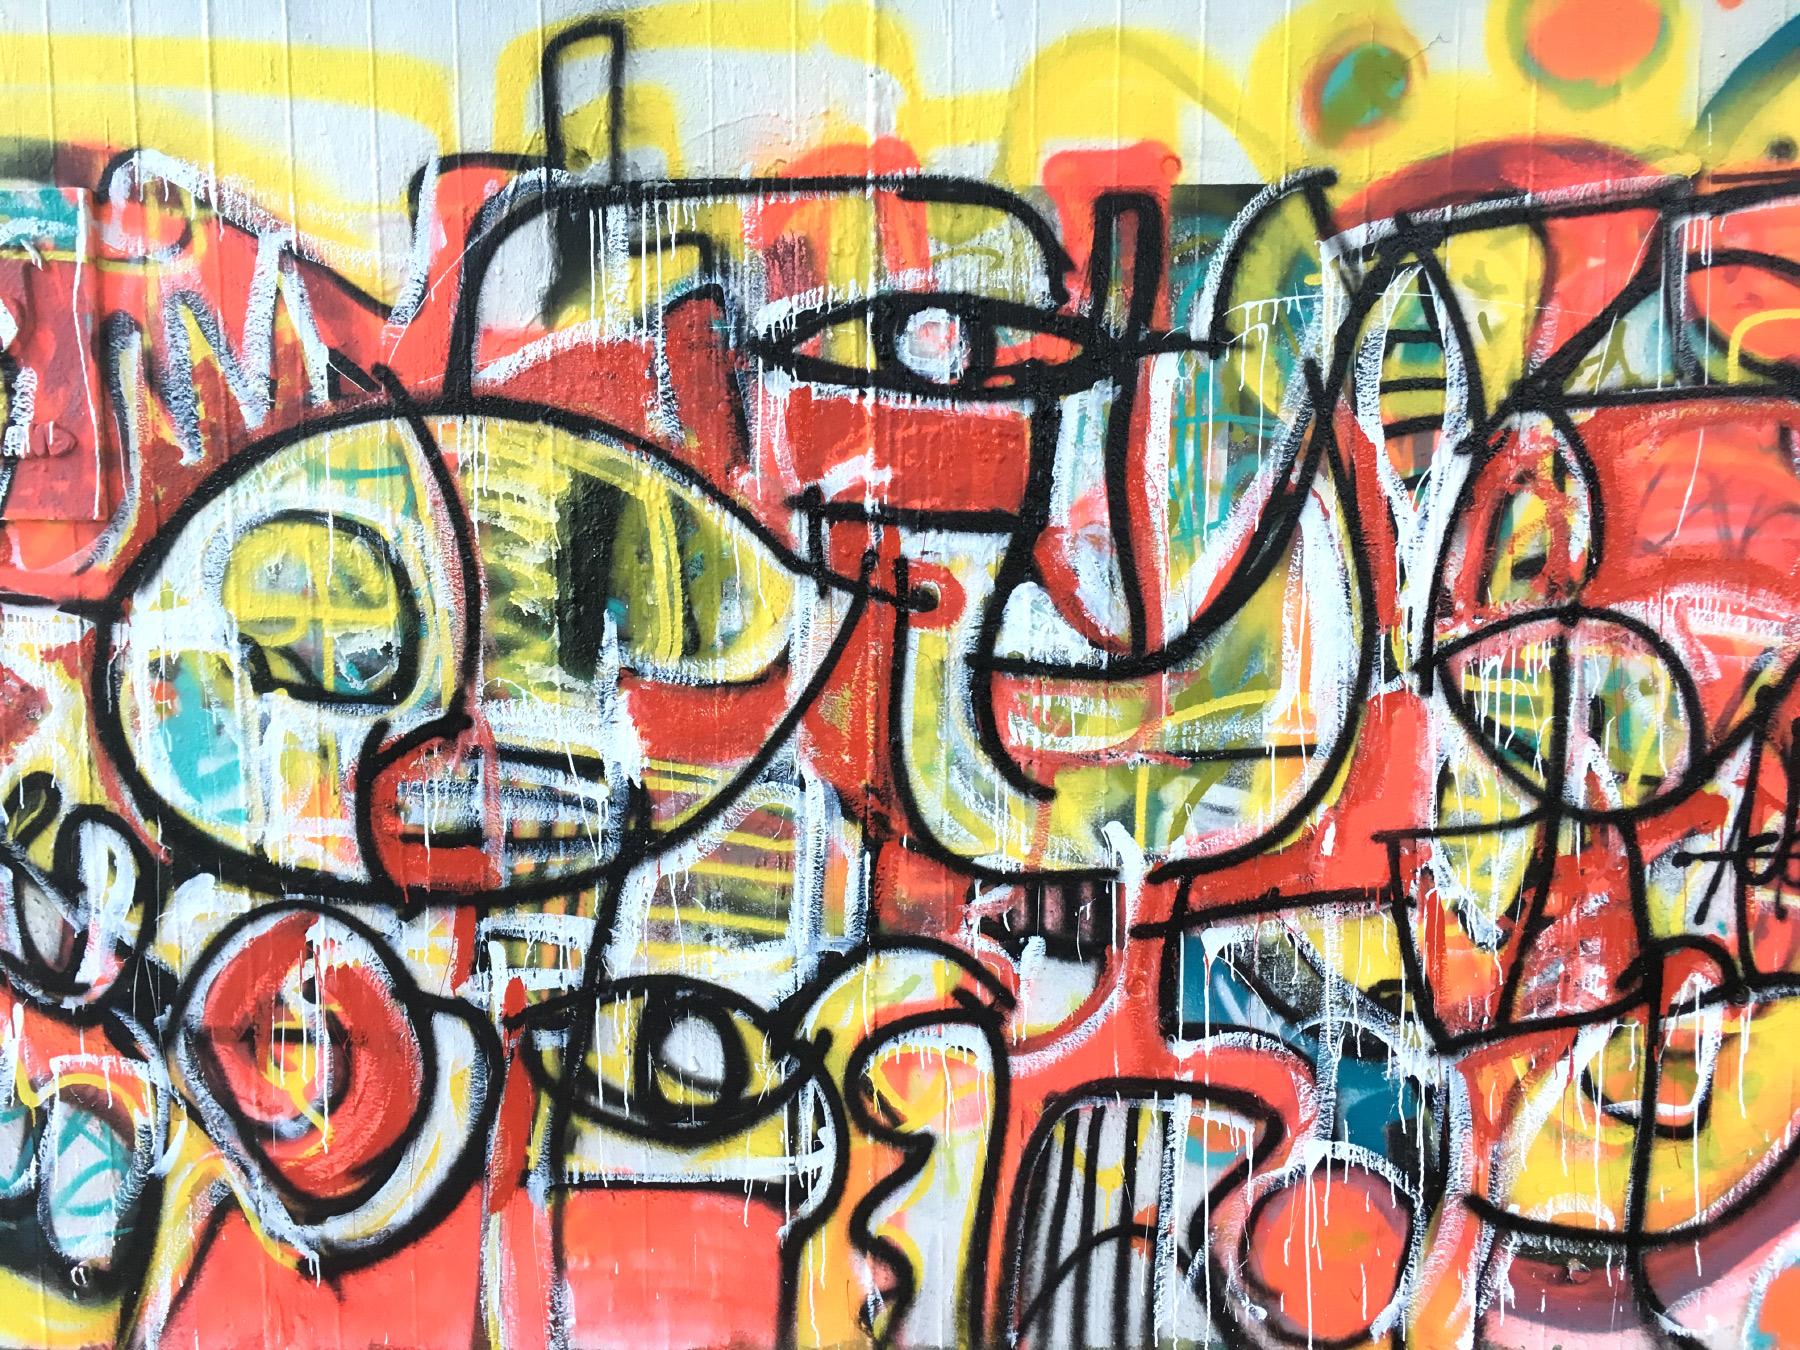 Rob_Adalierd_Painting_Vienna_Abstract_Contemporary_Street_art_4.jpg